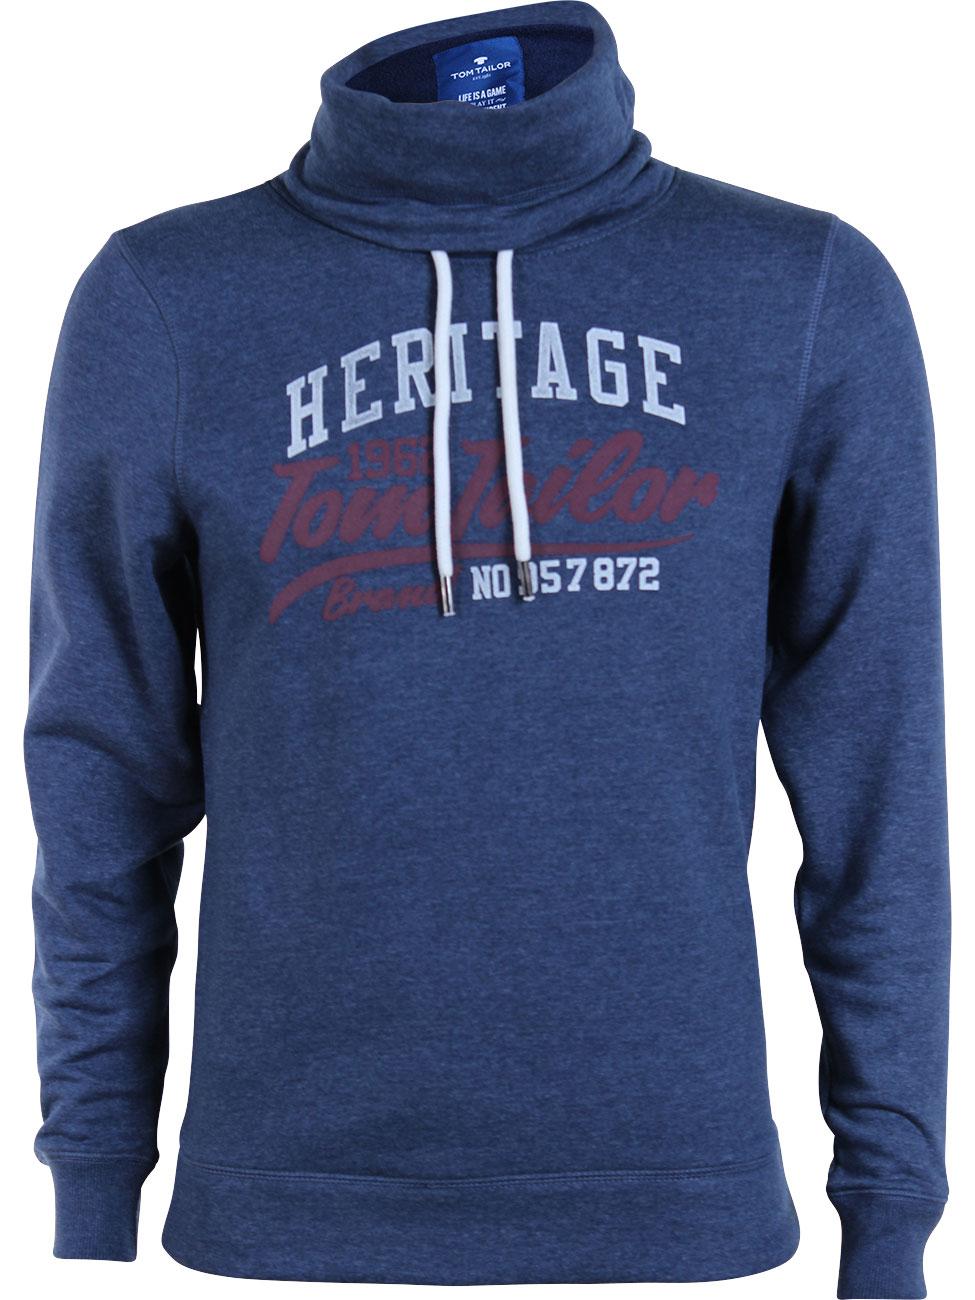 5a9ee6b8e506 Tom Tailor Herren Pullover Basic mit Logo Print kaufen - JEANS–DIRECT